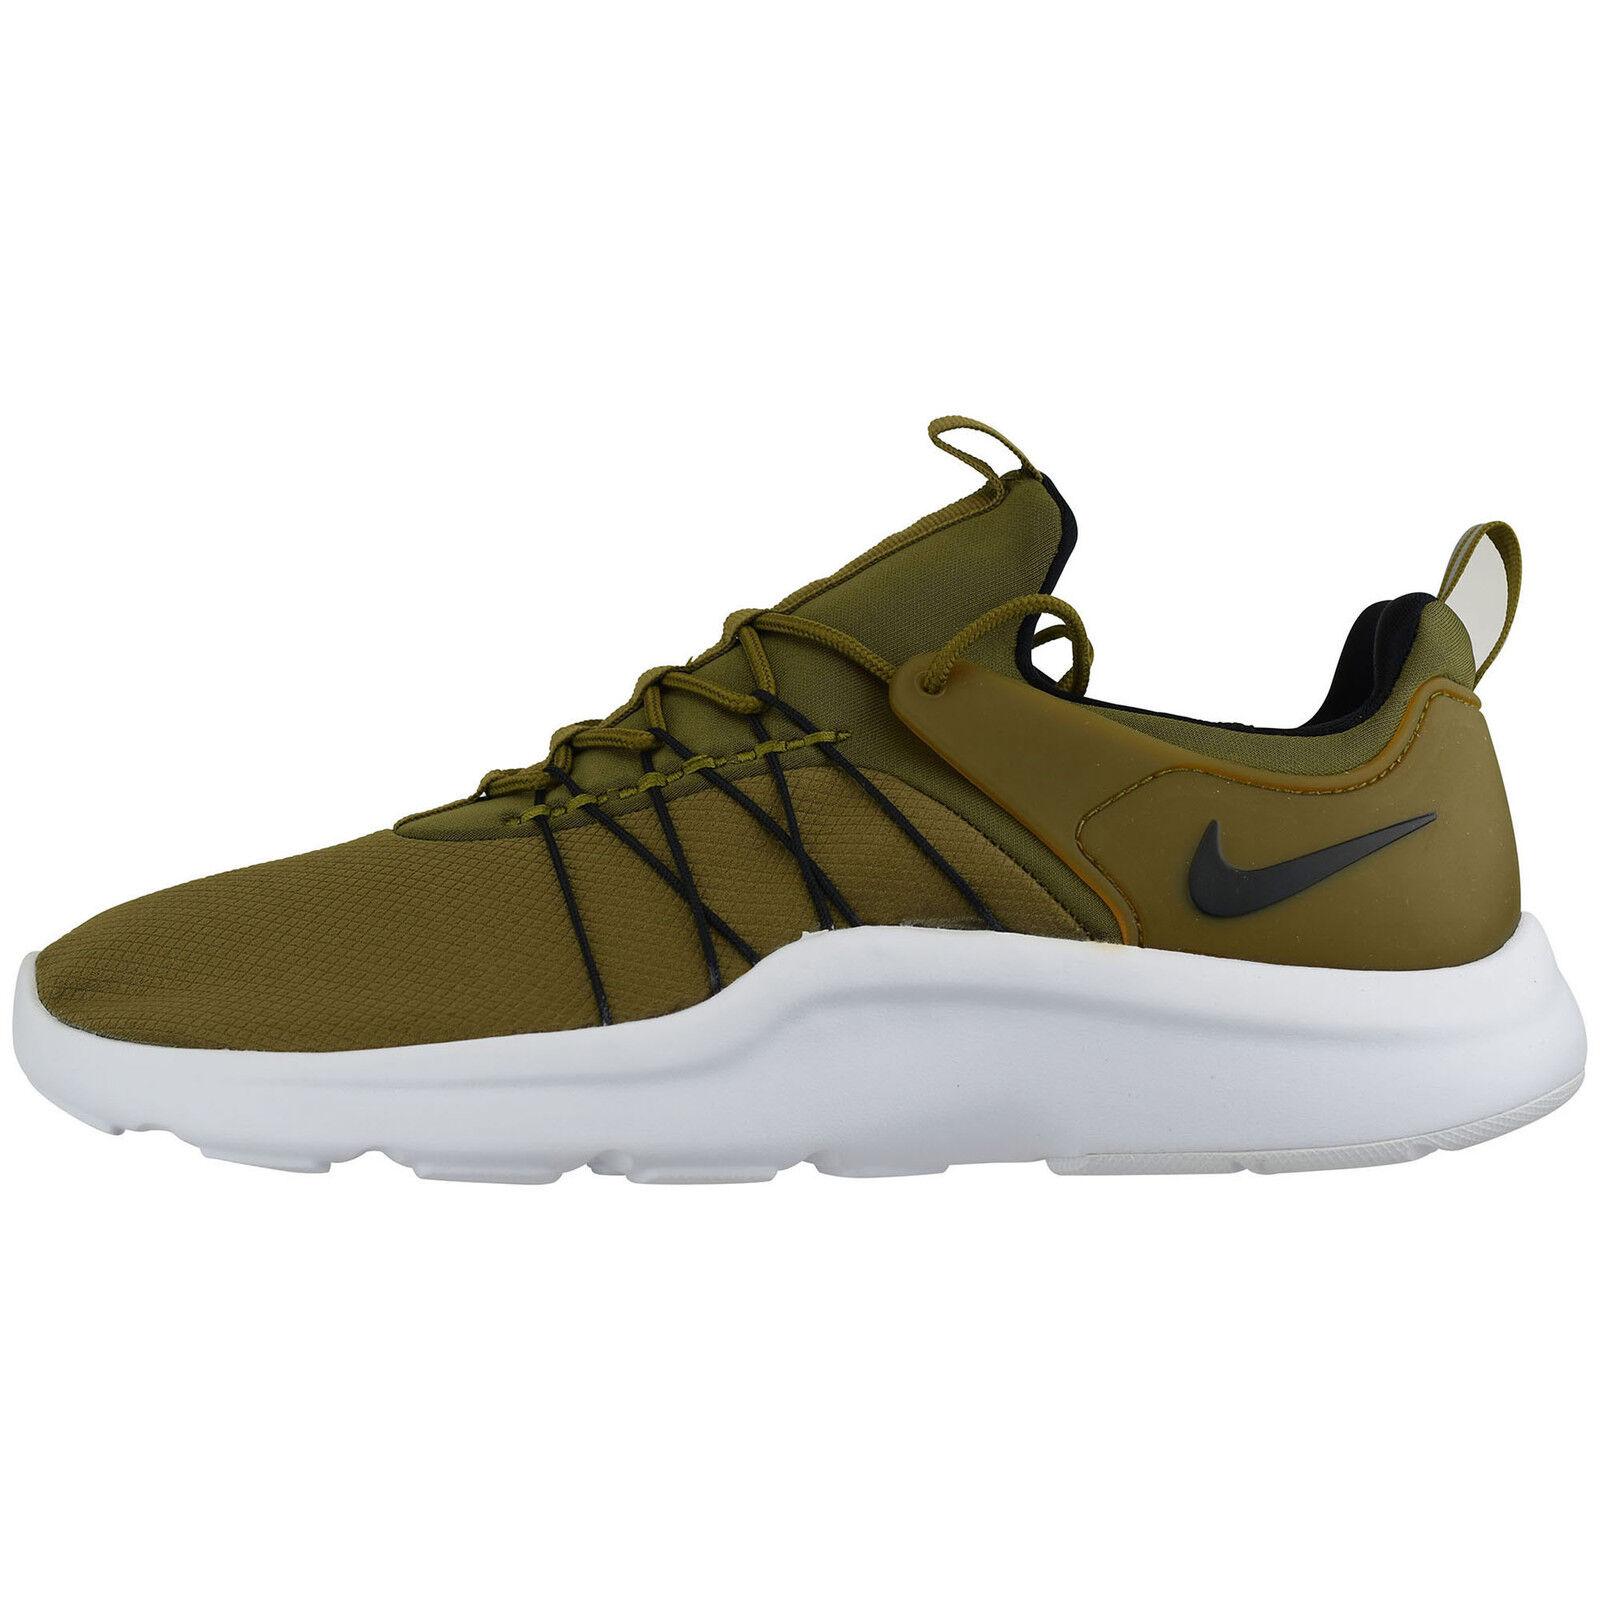 Nike Darwin shoes 819803-330 Lifestyle Laufschuhe Running Freizeit Sneaker